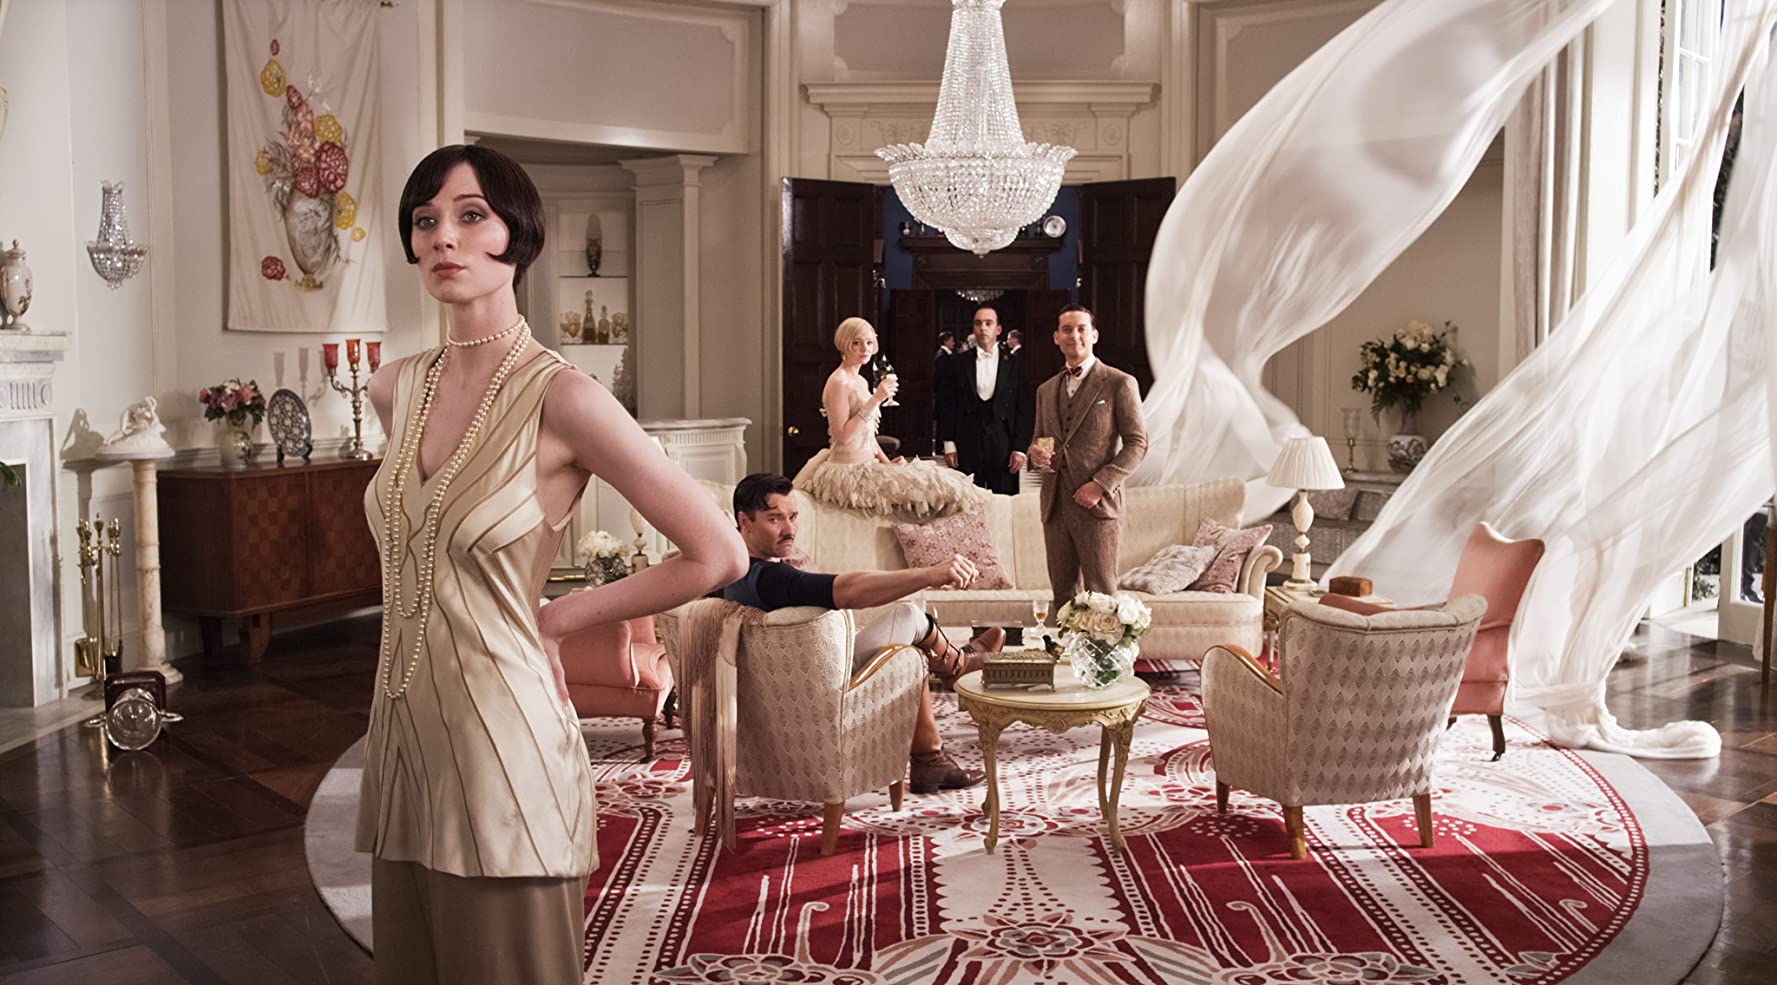 Tobey Maguire, Joel Edgerton, Carey Mulligan, and Elizabeth Debicki in The Great Gatsby (2013)